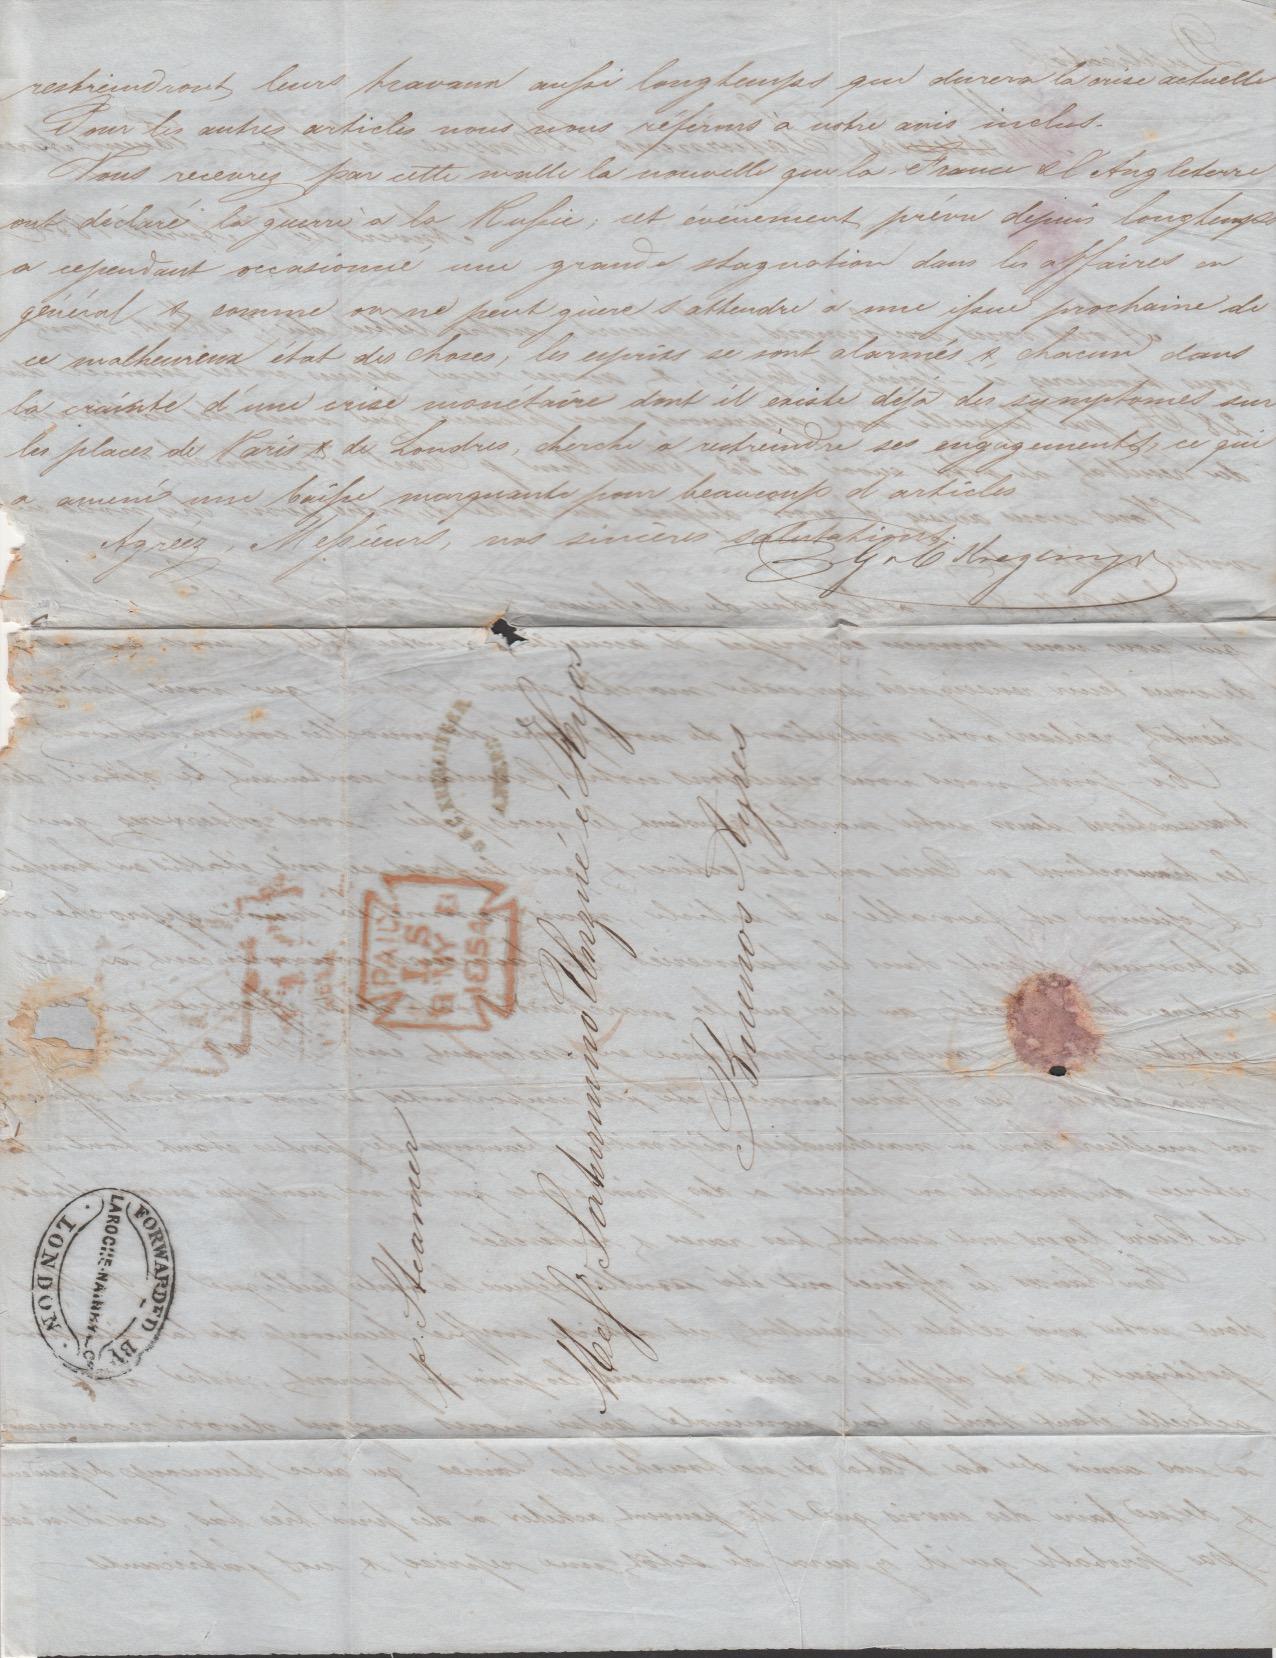 G.B. - London / Forwarding Agents 1854 - Image 4 of 4